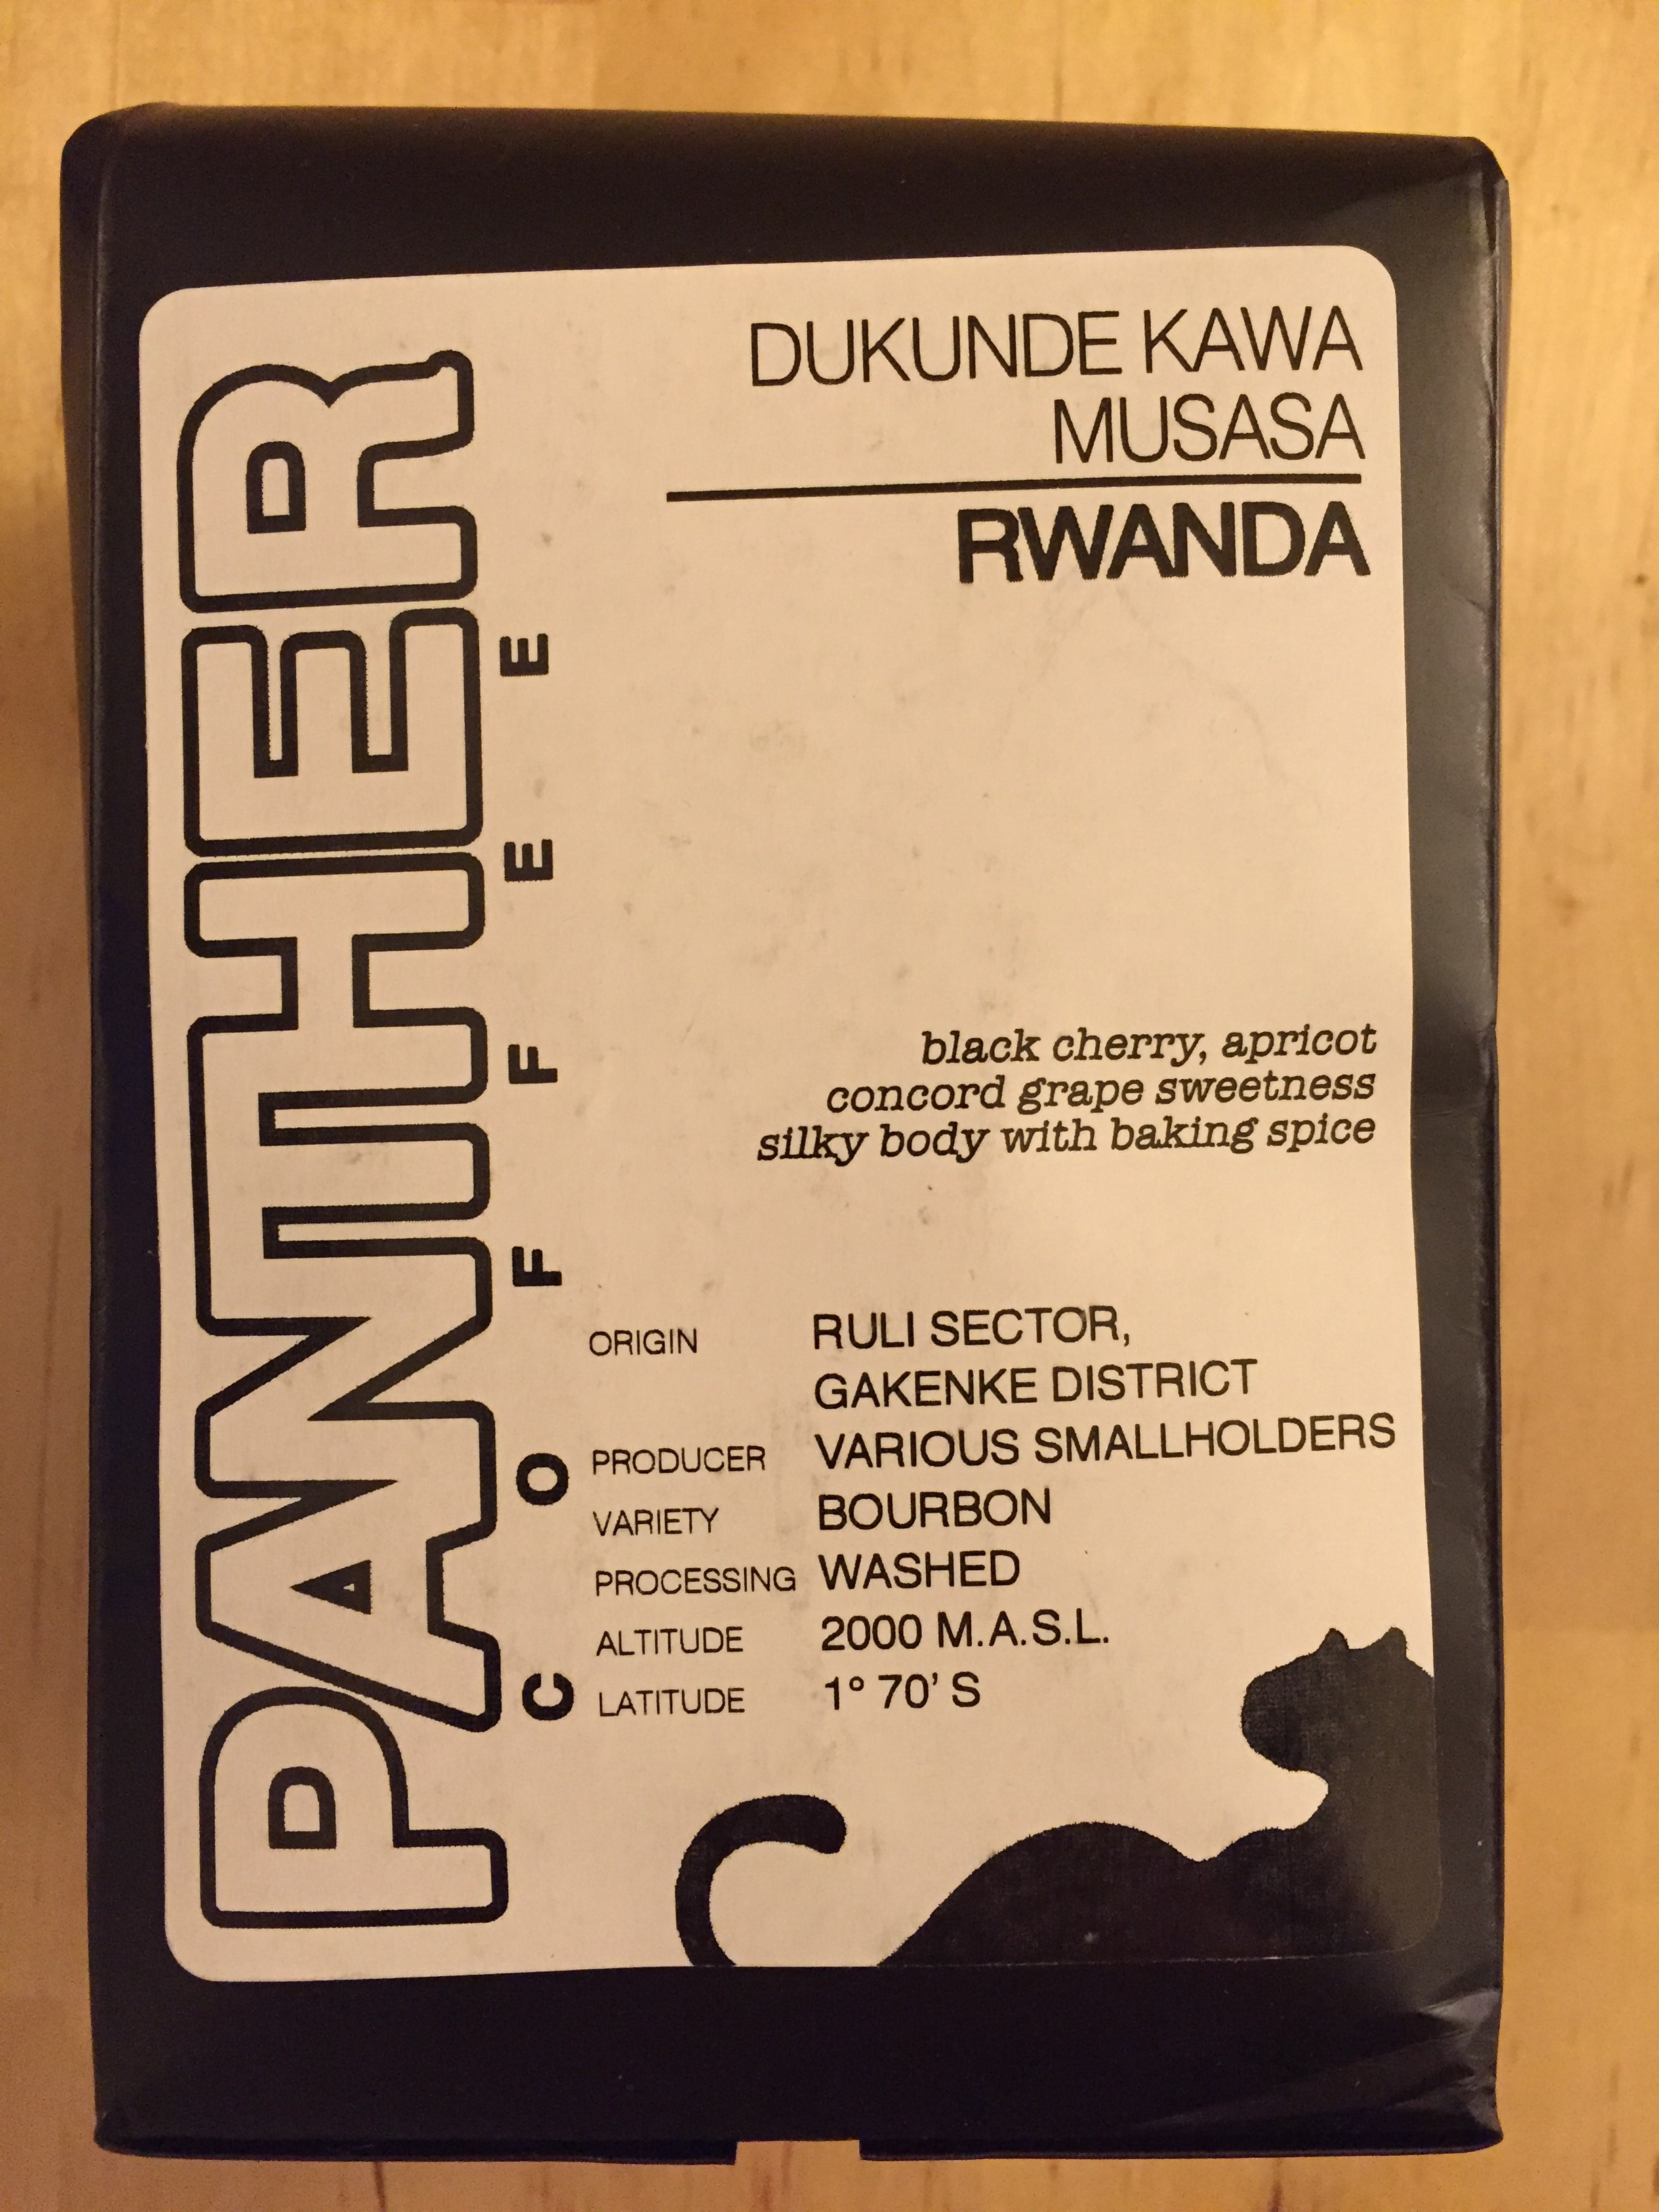 Panther Coffee - Rwanda Dukunde Kawa Musasa